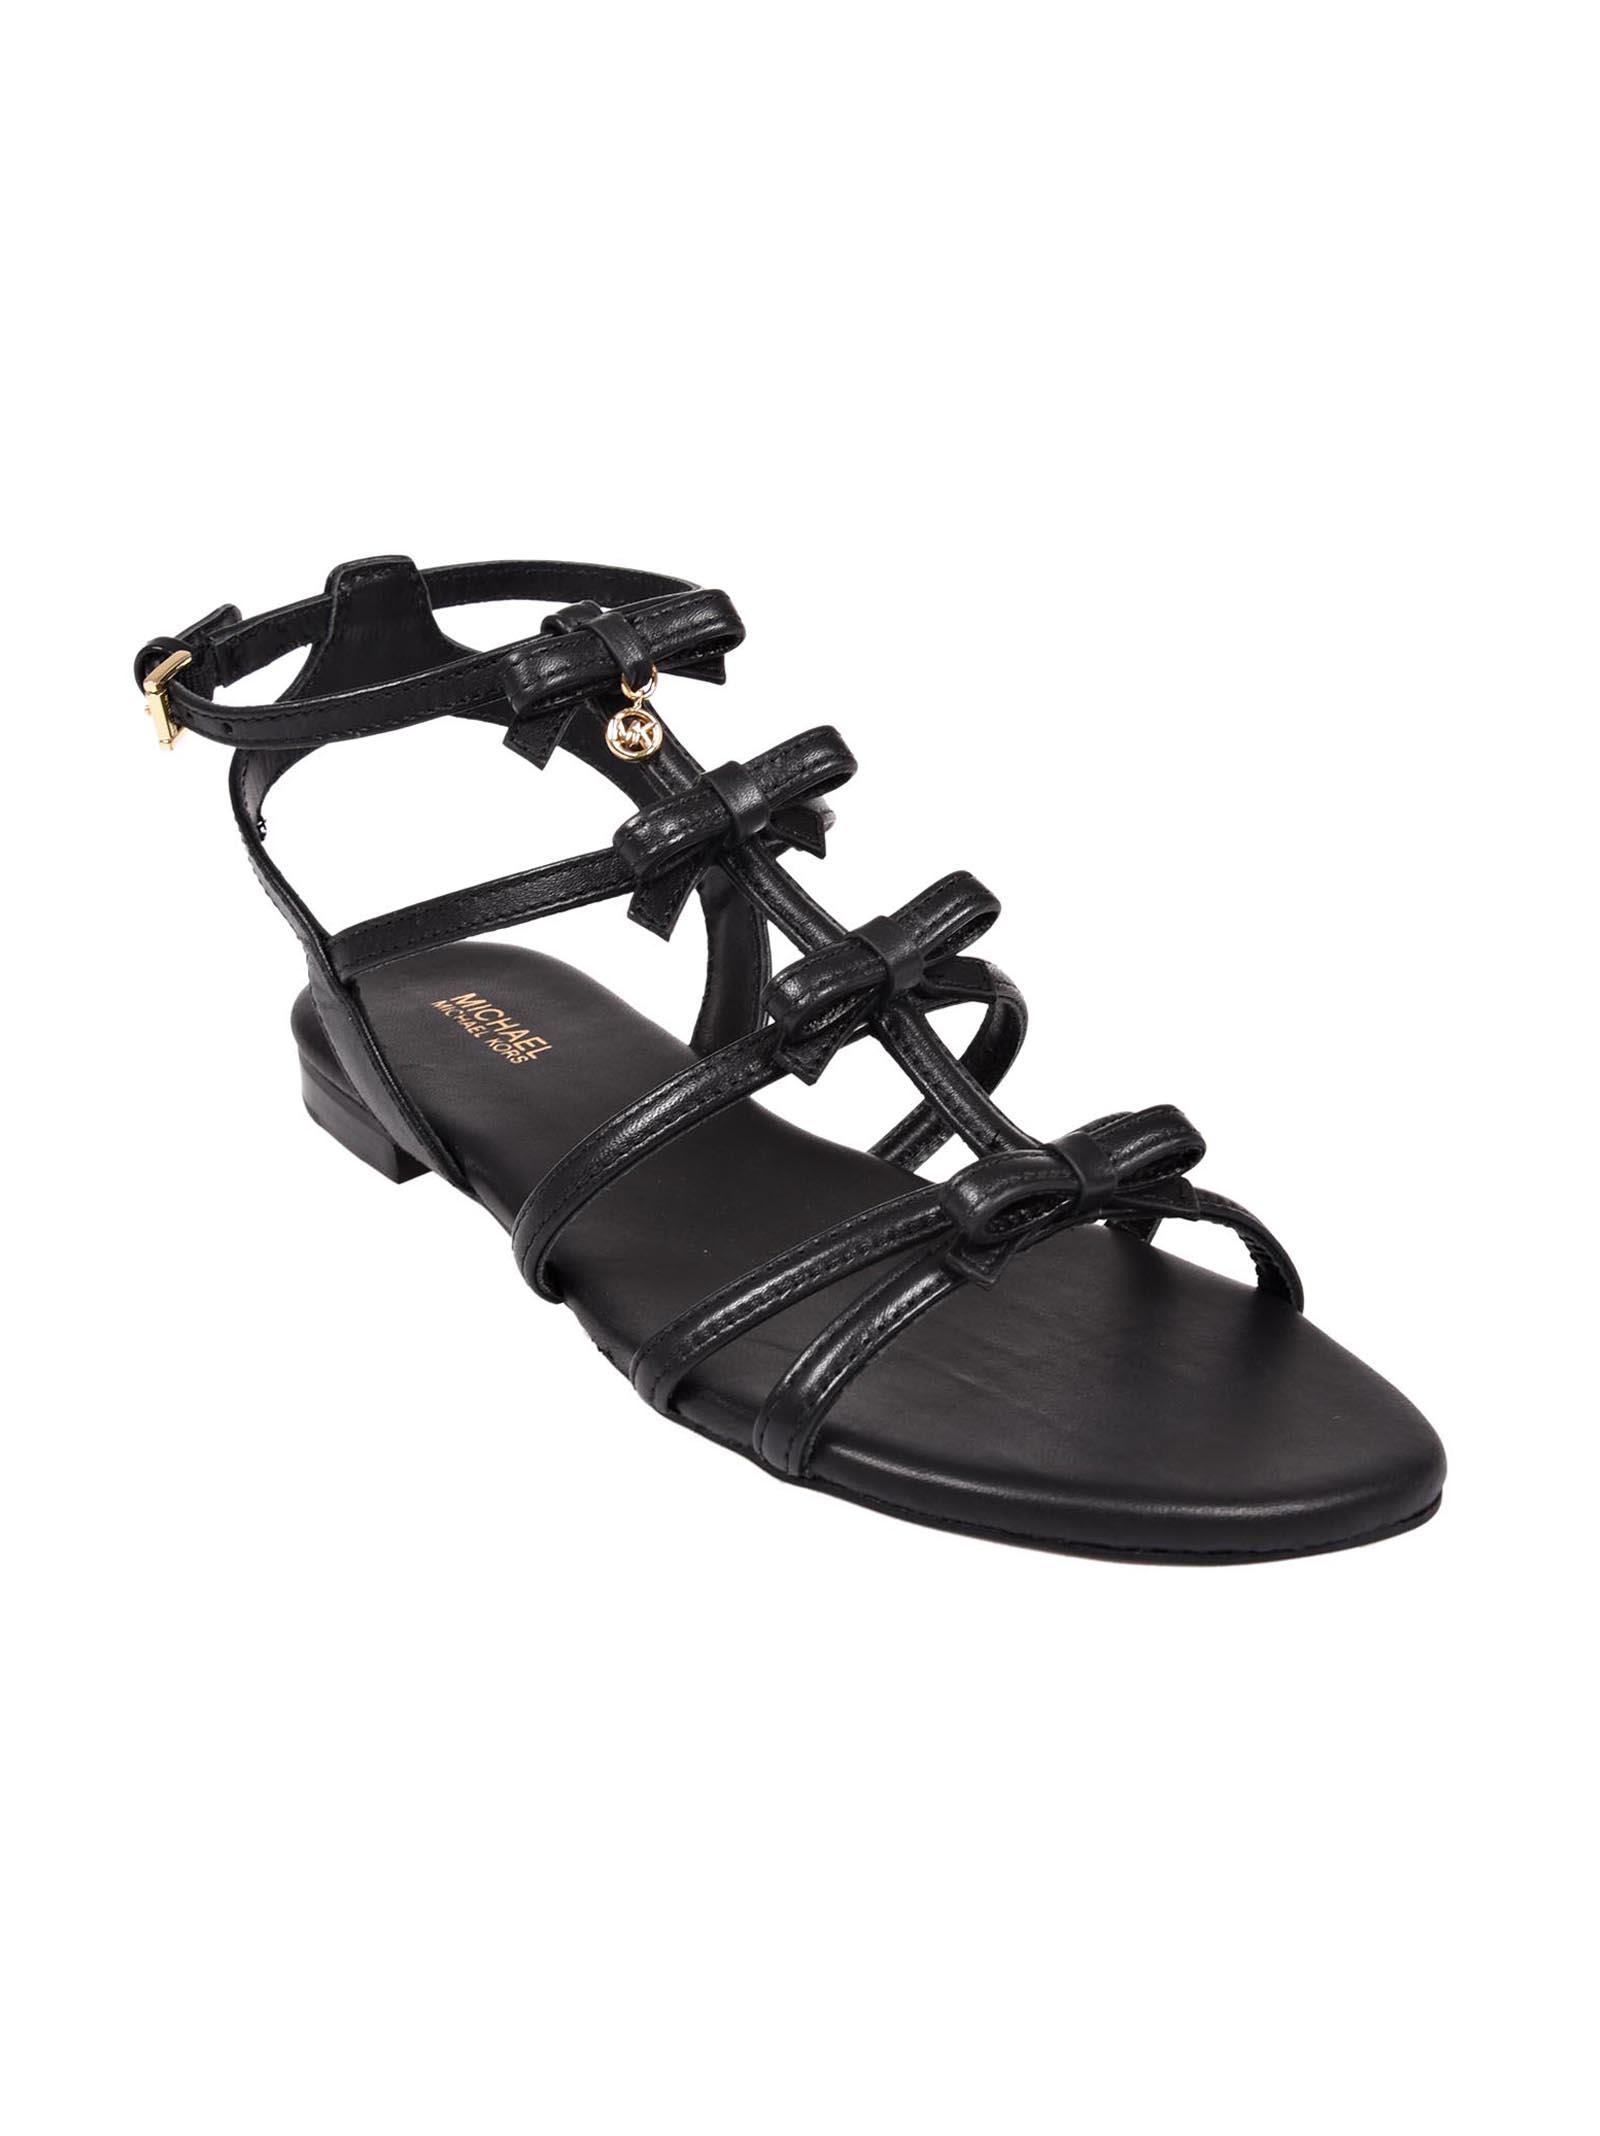 Michael Kors Veronica flat sandals Ro3GK4VGgU